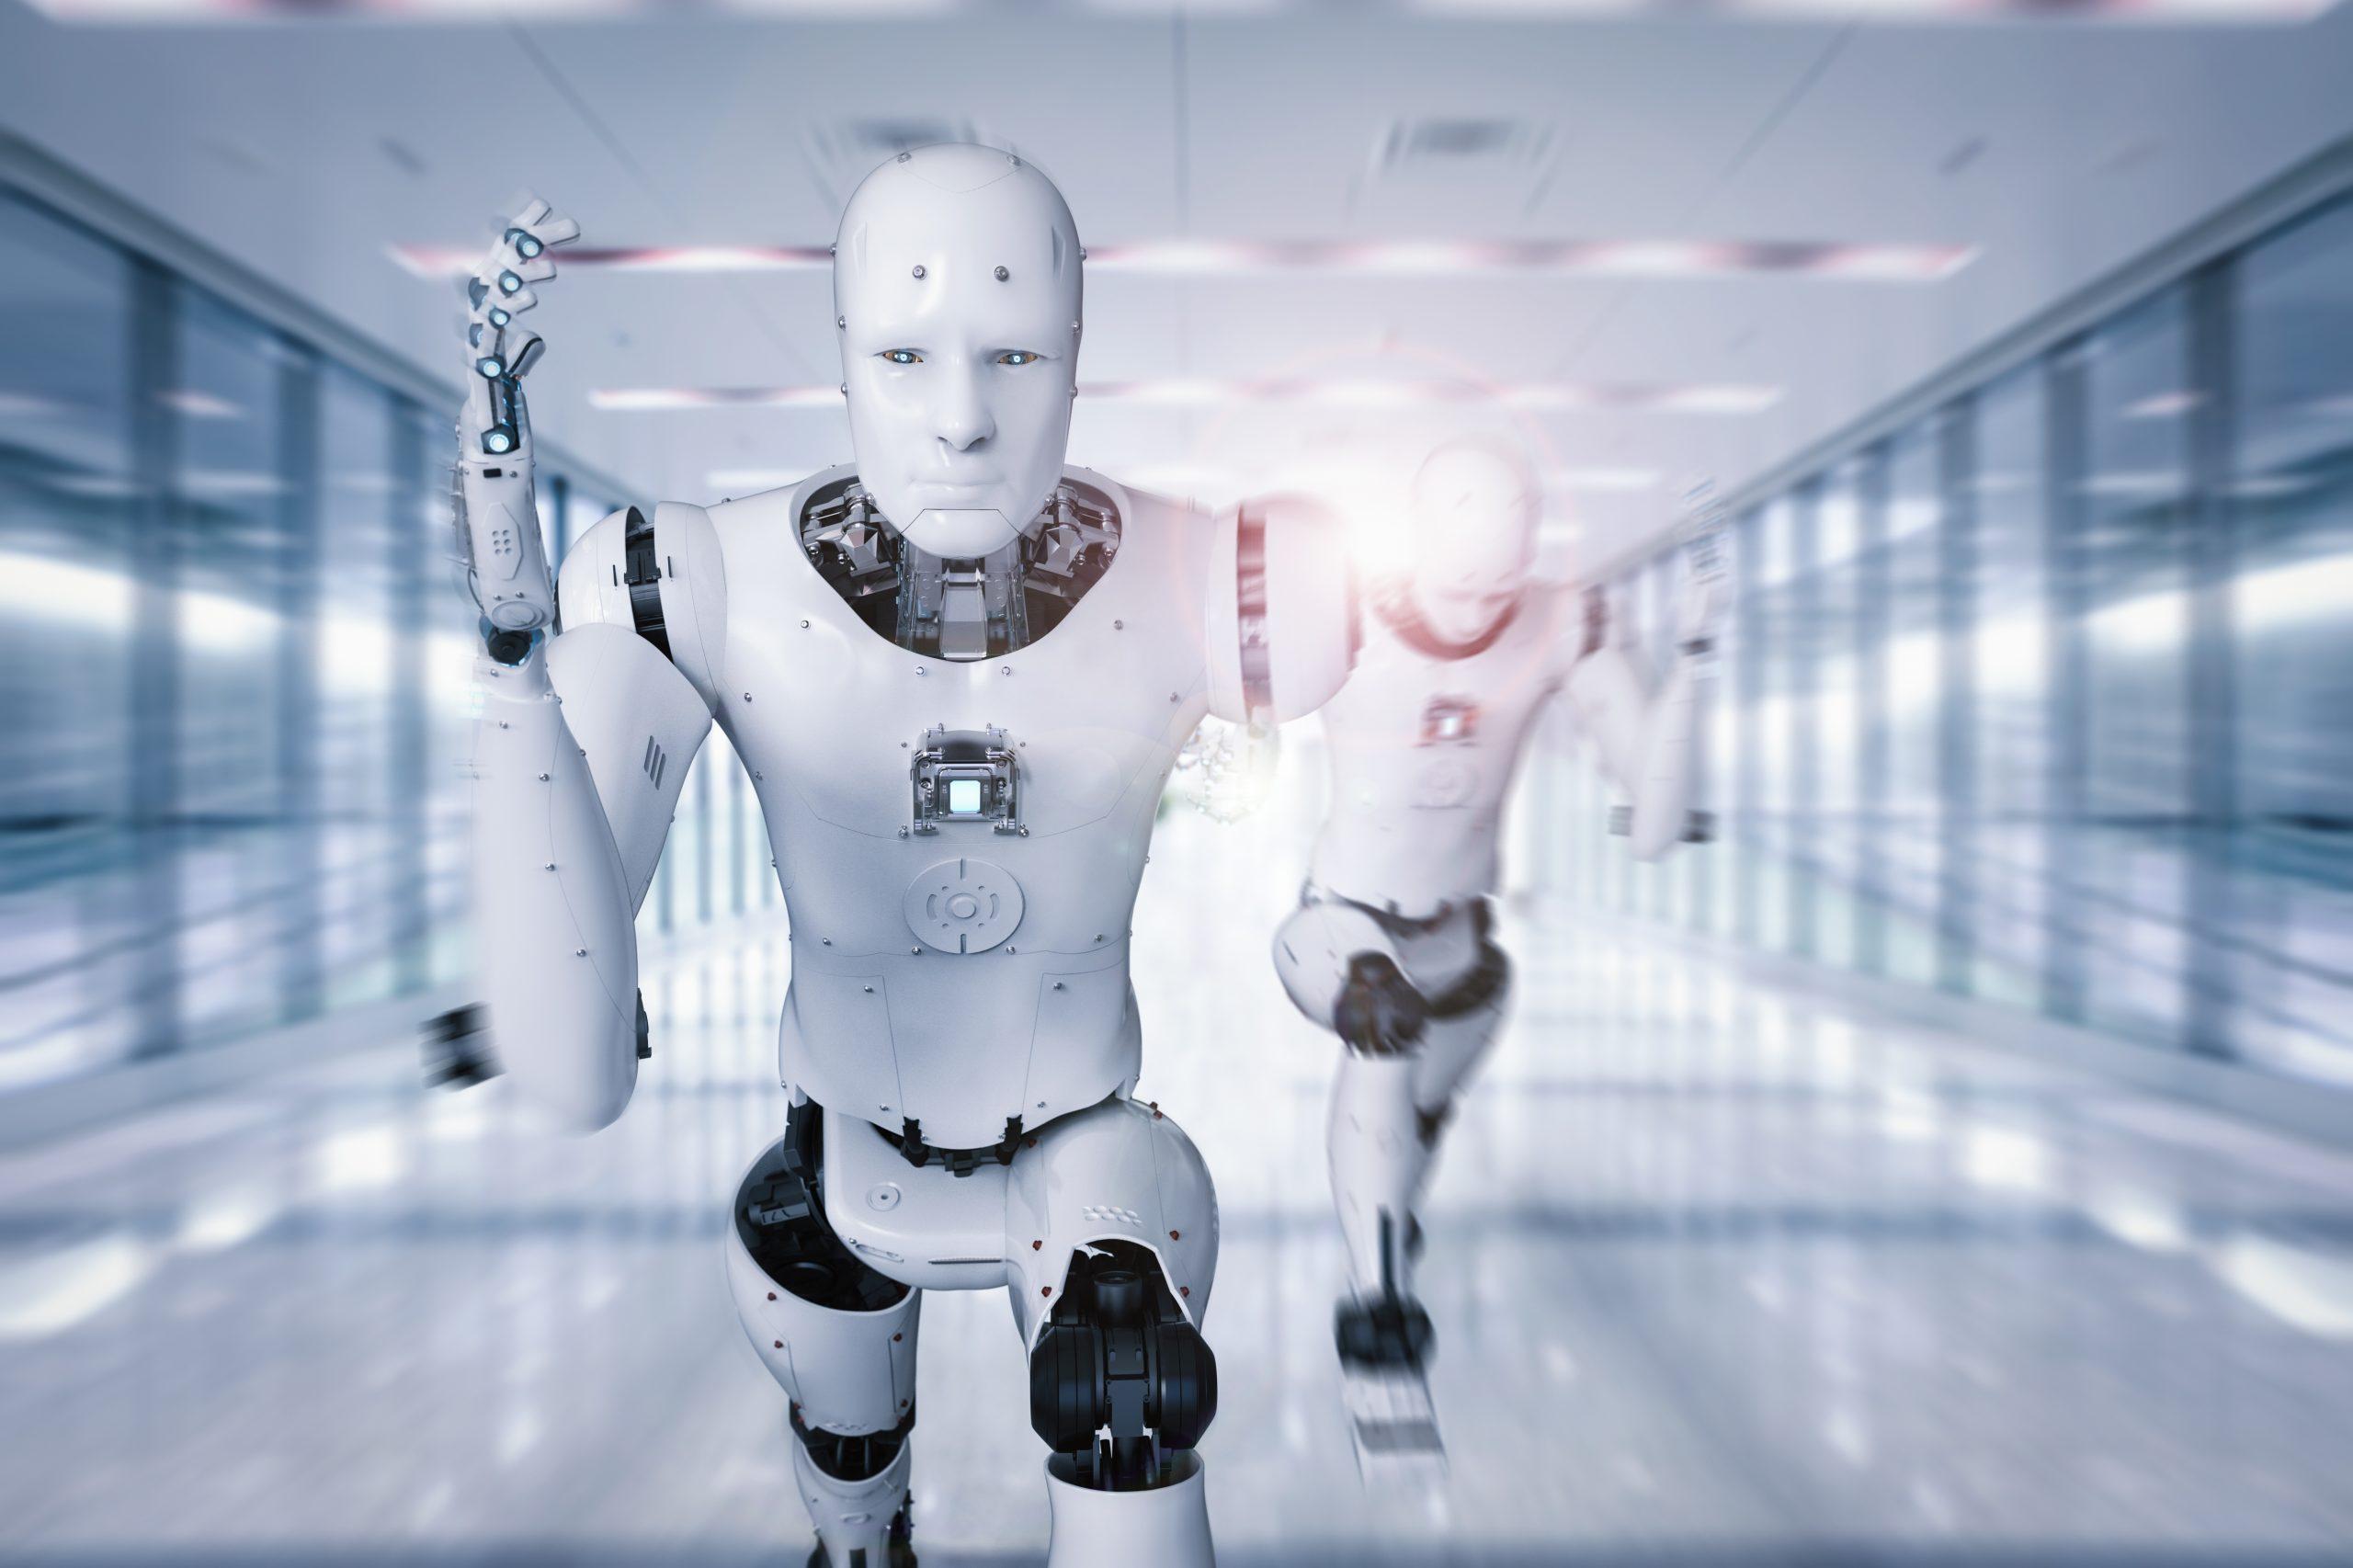 https://depositphotos.com/162980480/stock-photo-cyborg-running-fast.html